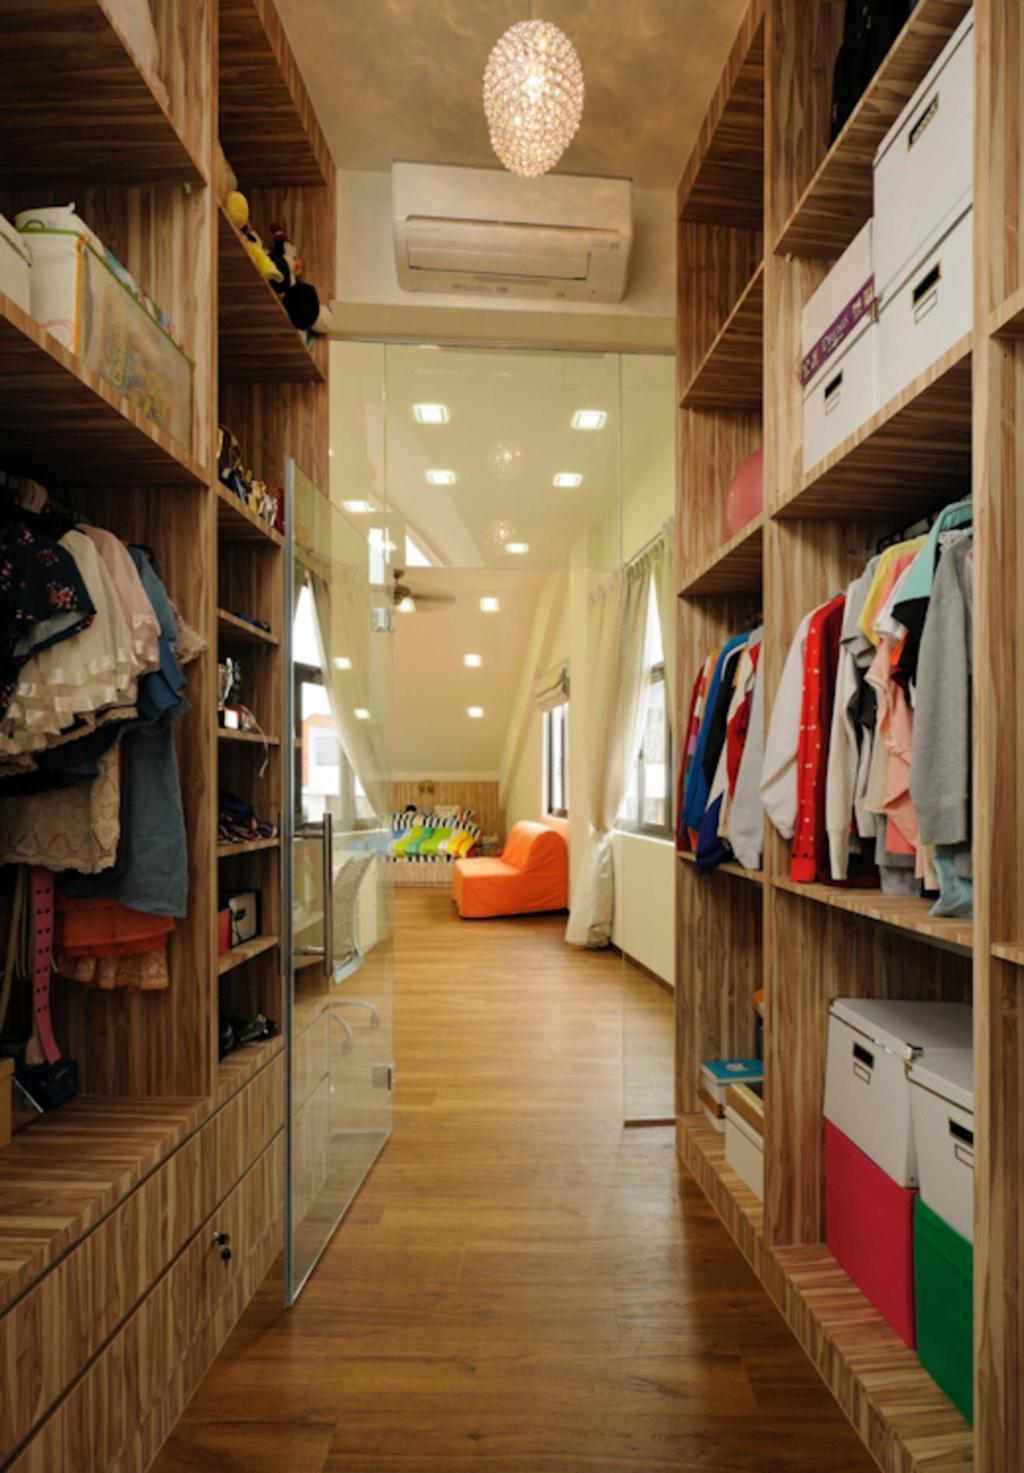 Traditional, Landed, Bedroom, Butterfly Avenue, Interior Designer, Icon Interior Design, Walk In Wardobe, Parquet, Shelf, Shelves, Storage, Wood, Laminate, Wood Laminate, Hanging Light, Pendant Light